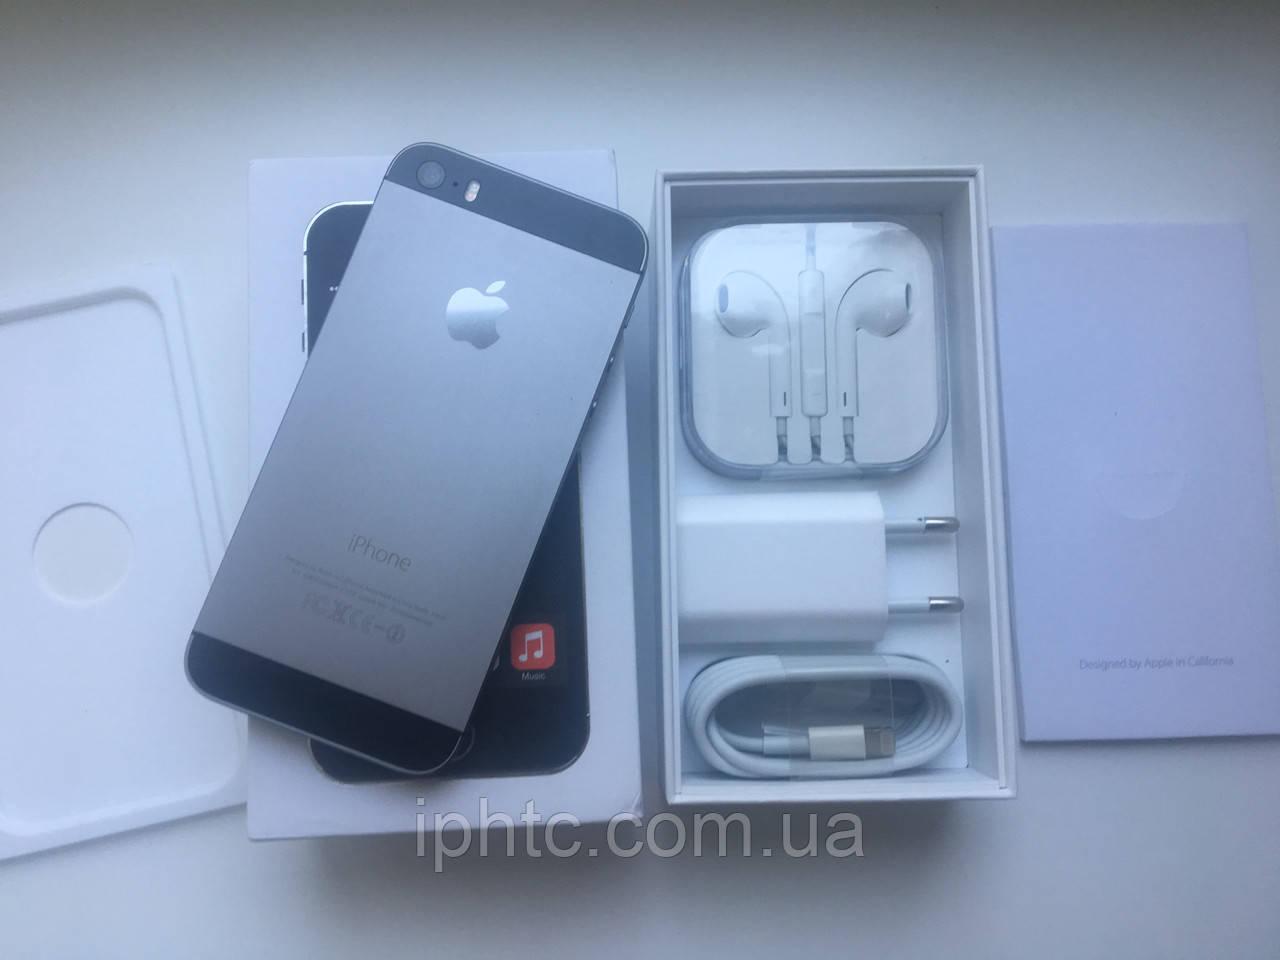 Apple iPhone 5S 16GB Space Grey. Как новый